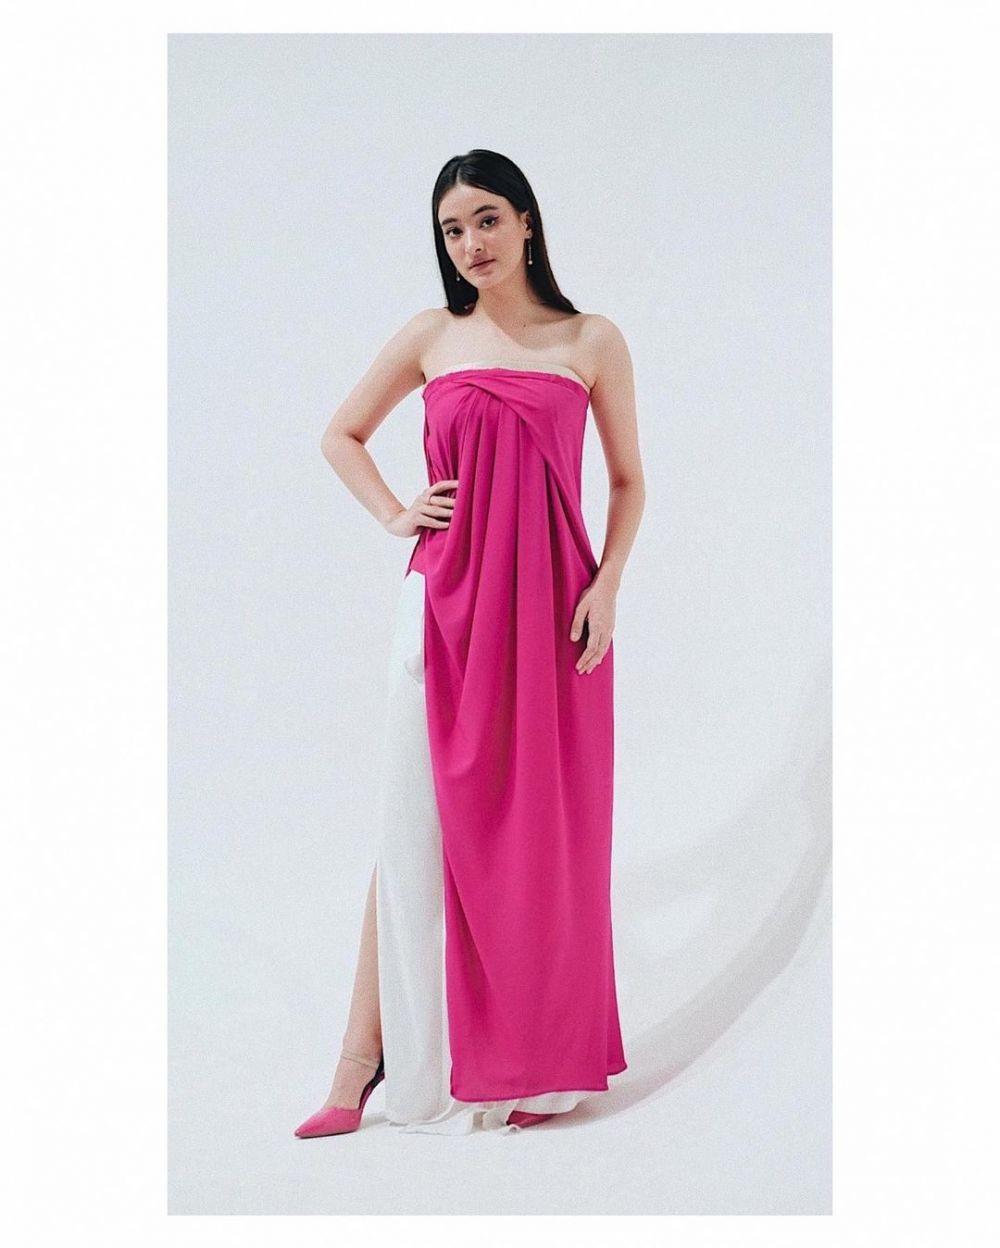 9 Inspirasi Dress ala Mawar Eva de Jongh, Perpaduannya Unik!